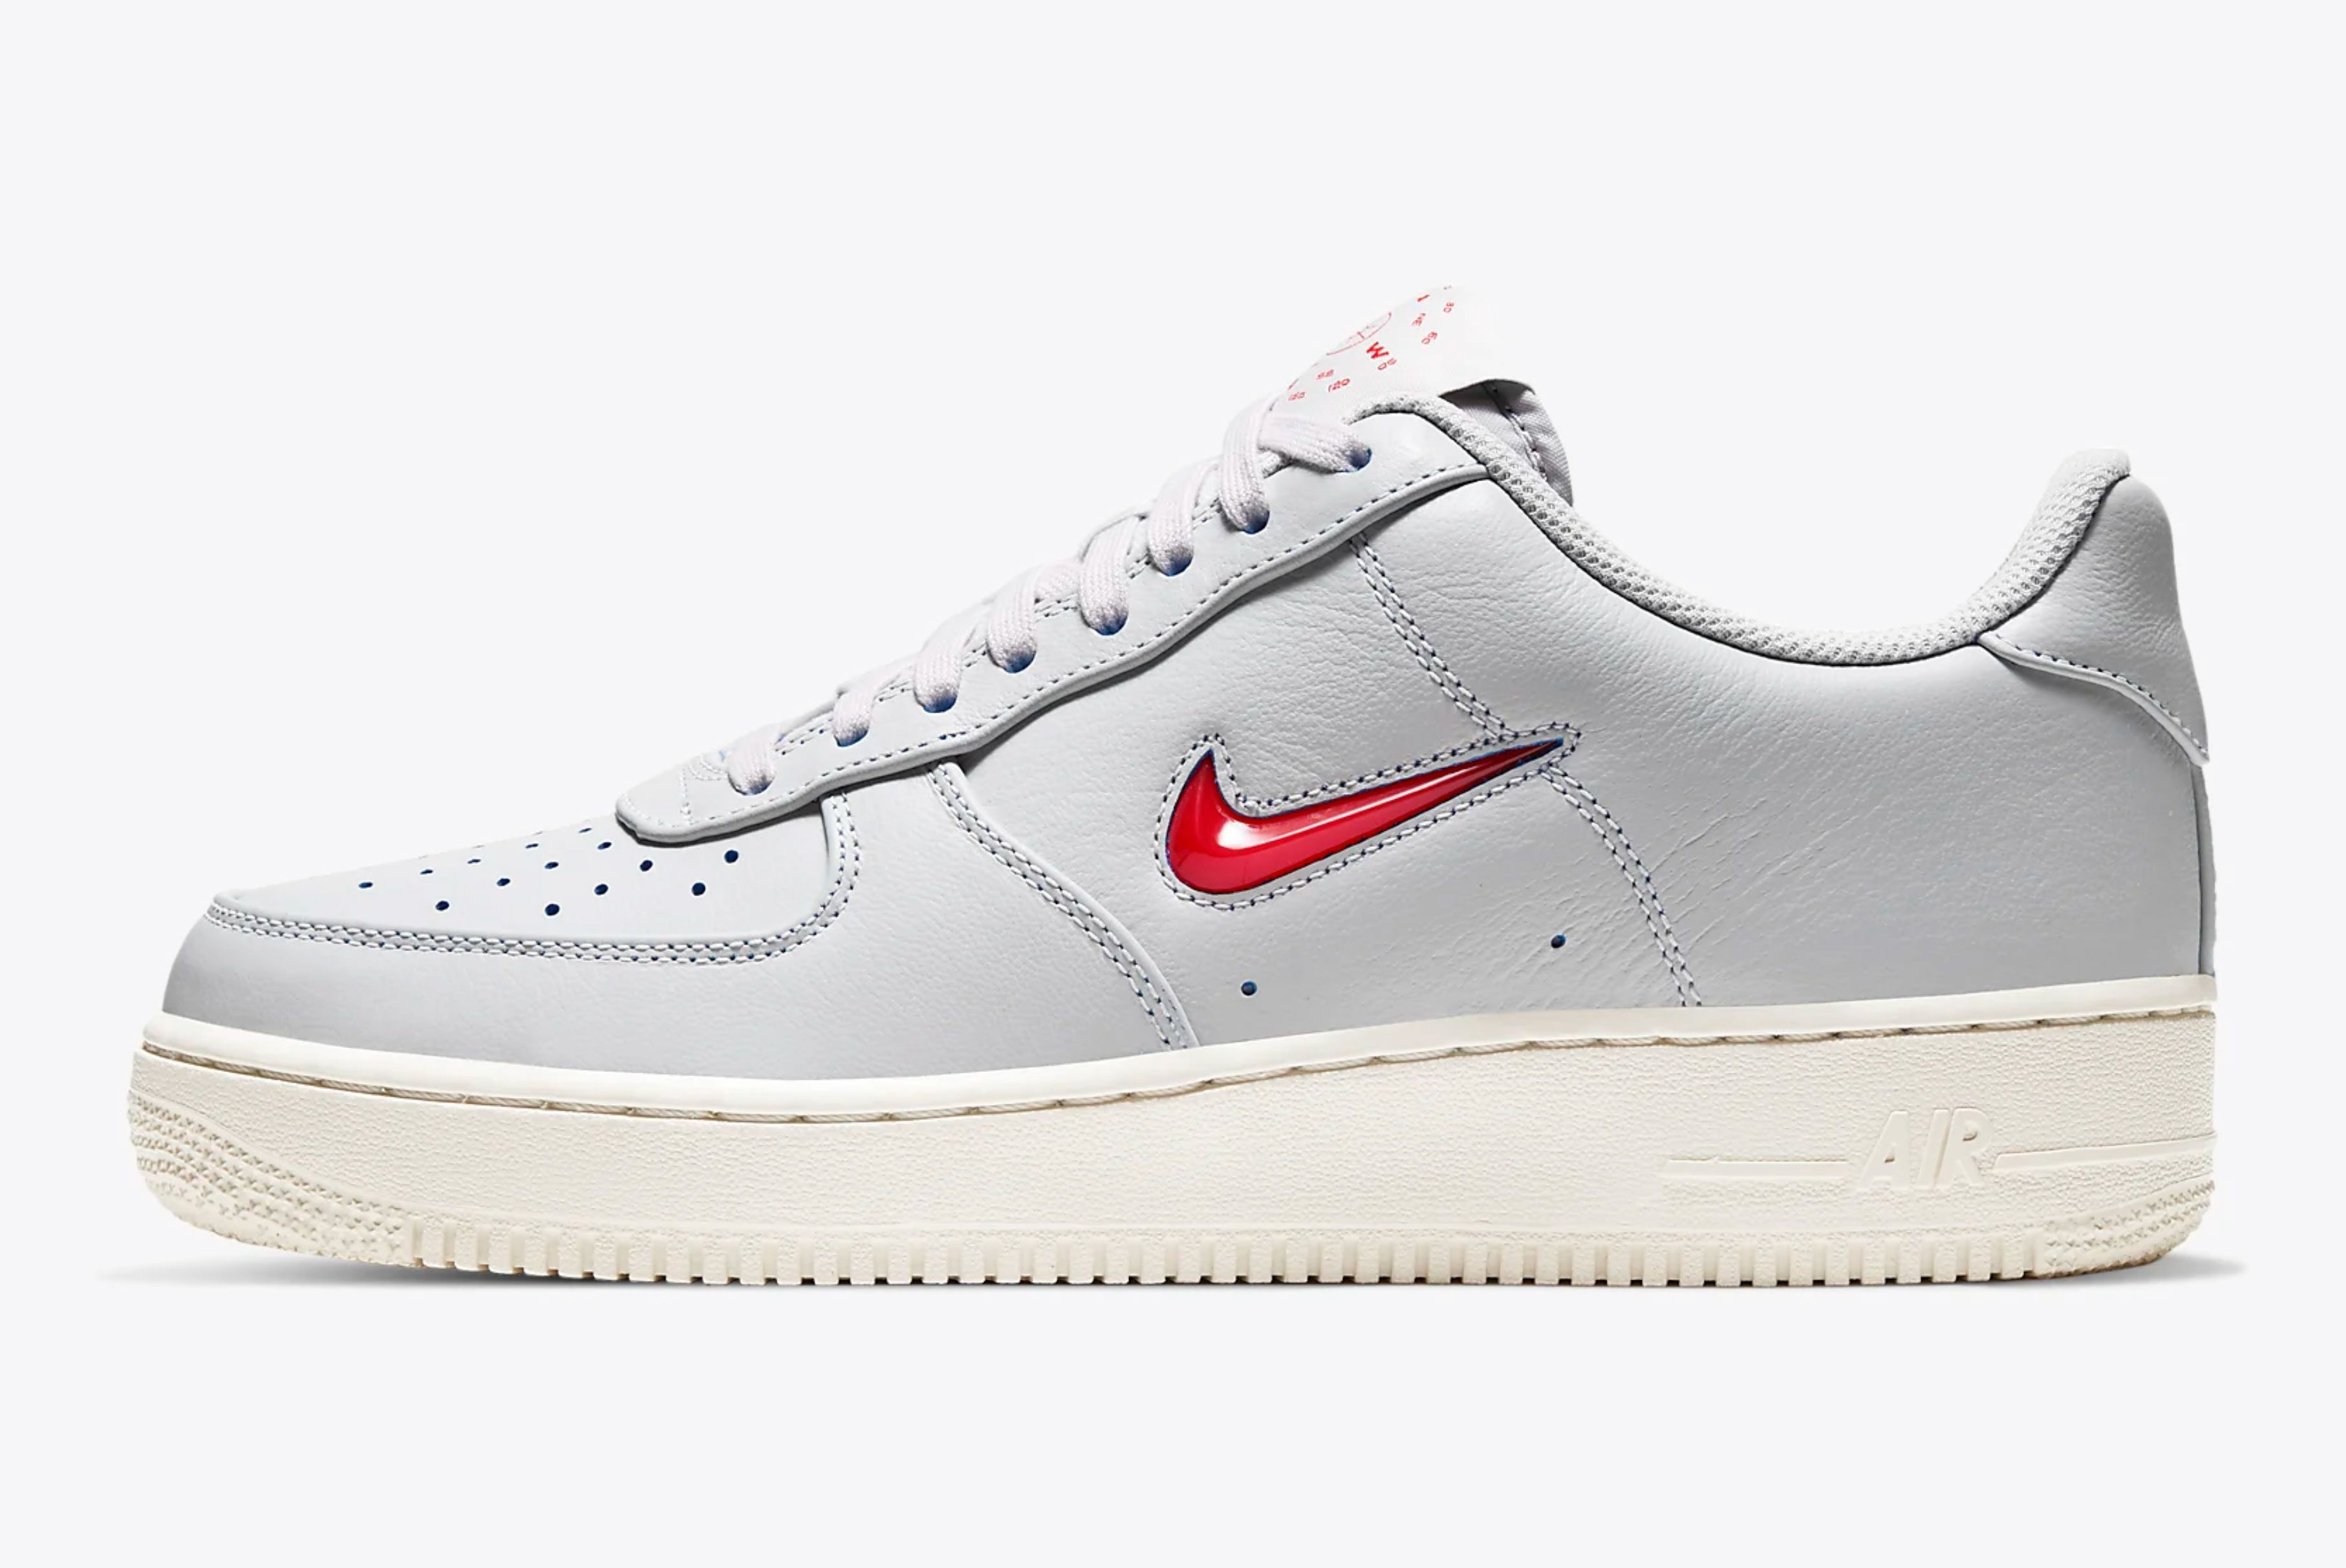 Nike Air Force 1 Jewel 'Vast Grey'